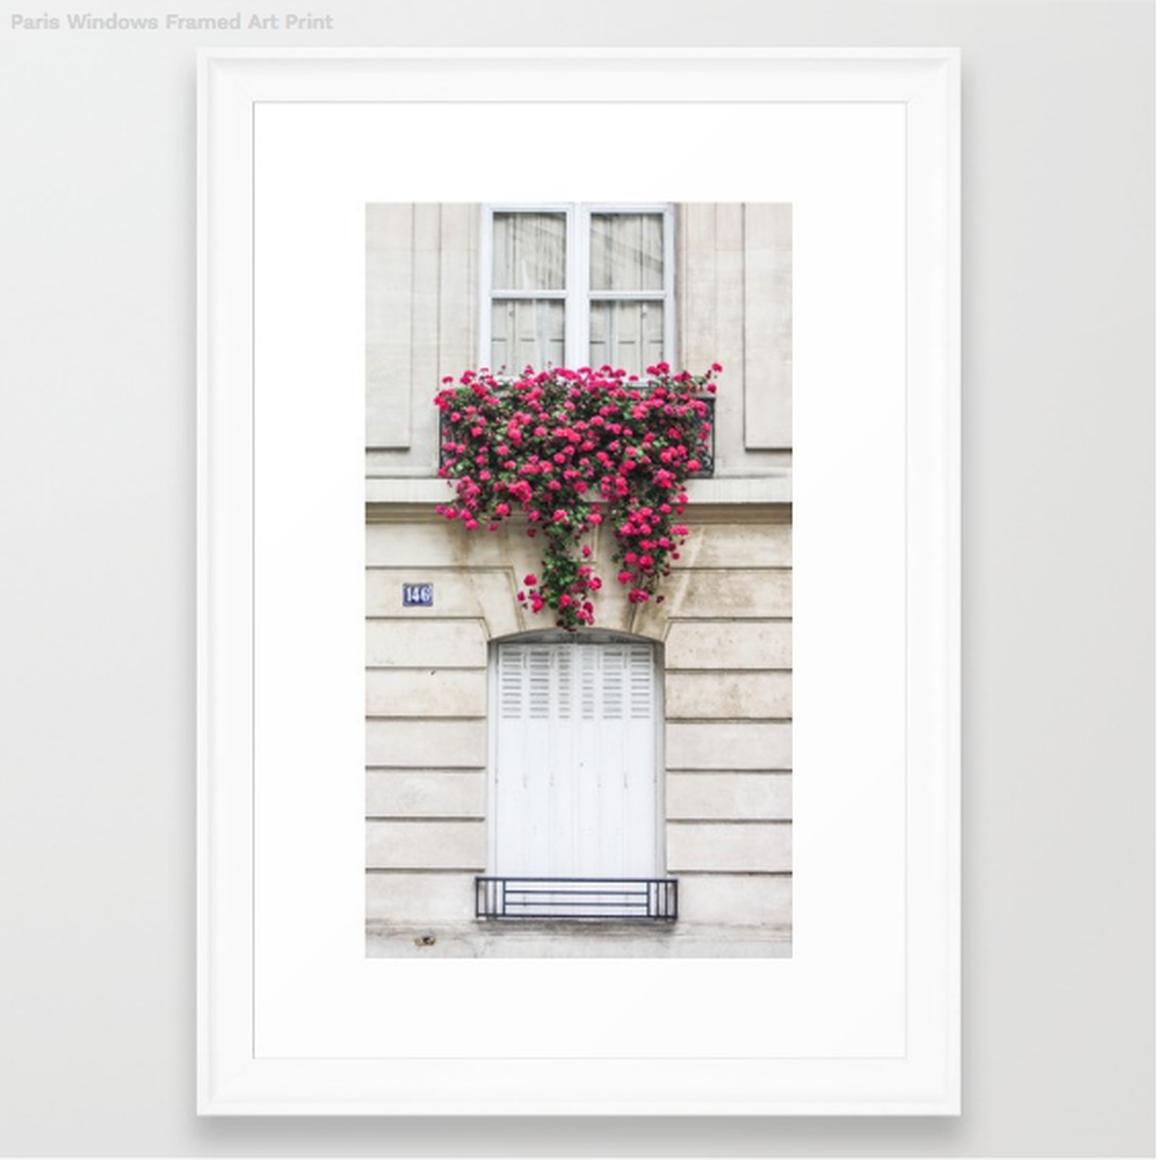 Paris Windows Framed Print, Scoop White Frame, 15 X 21... by Society ...